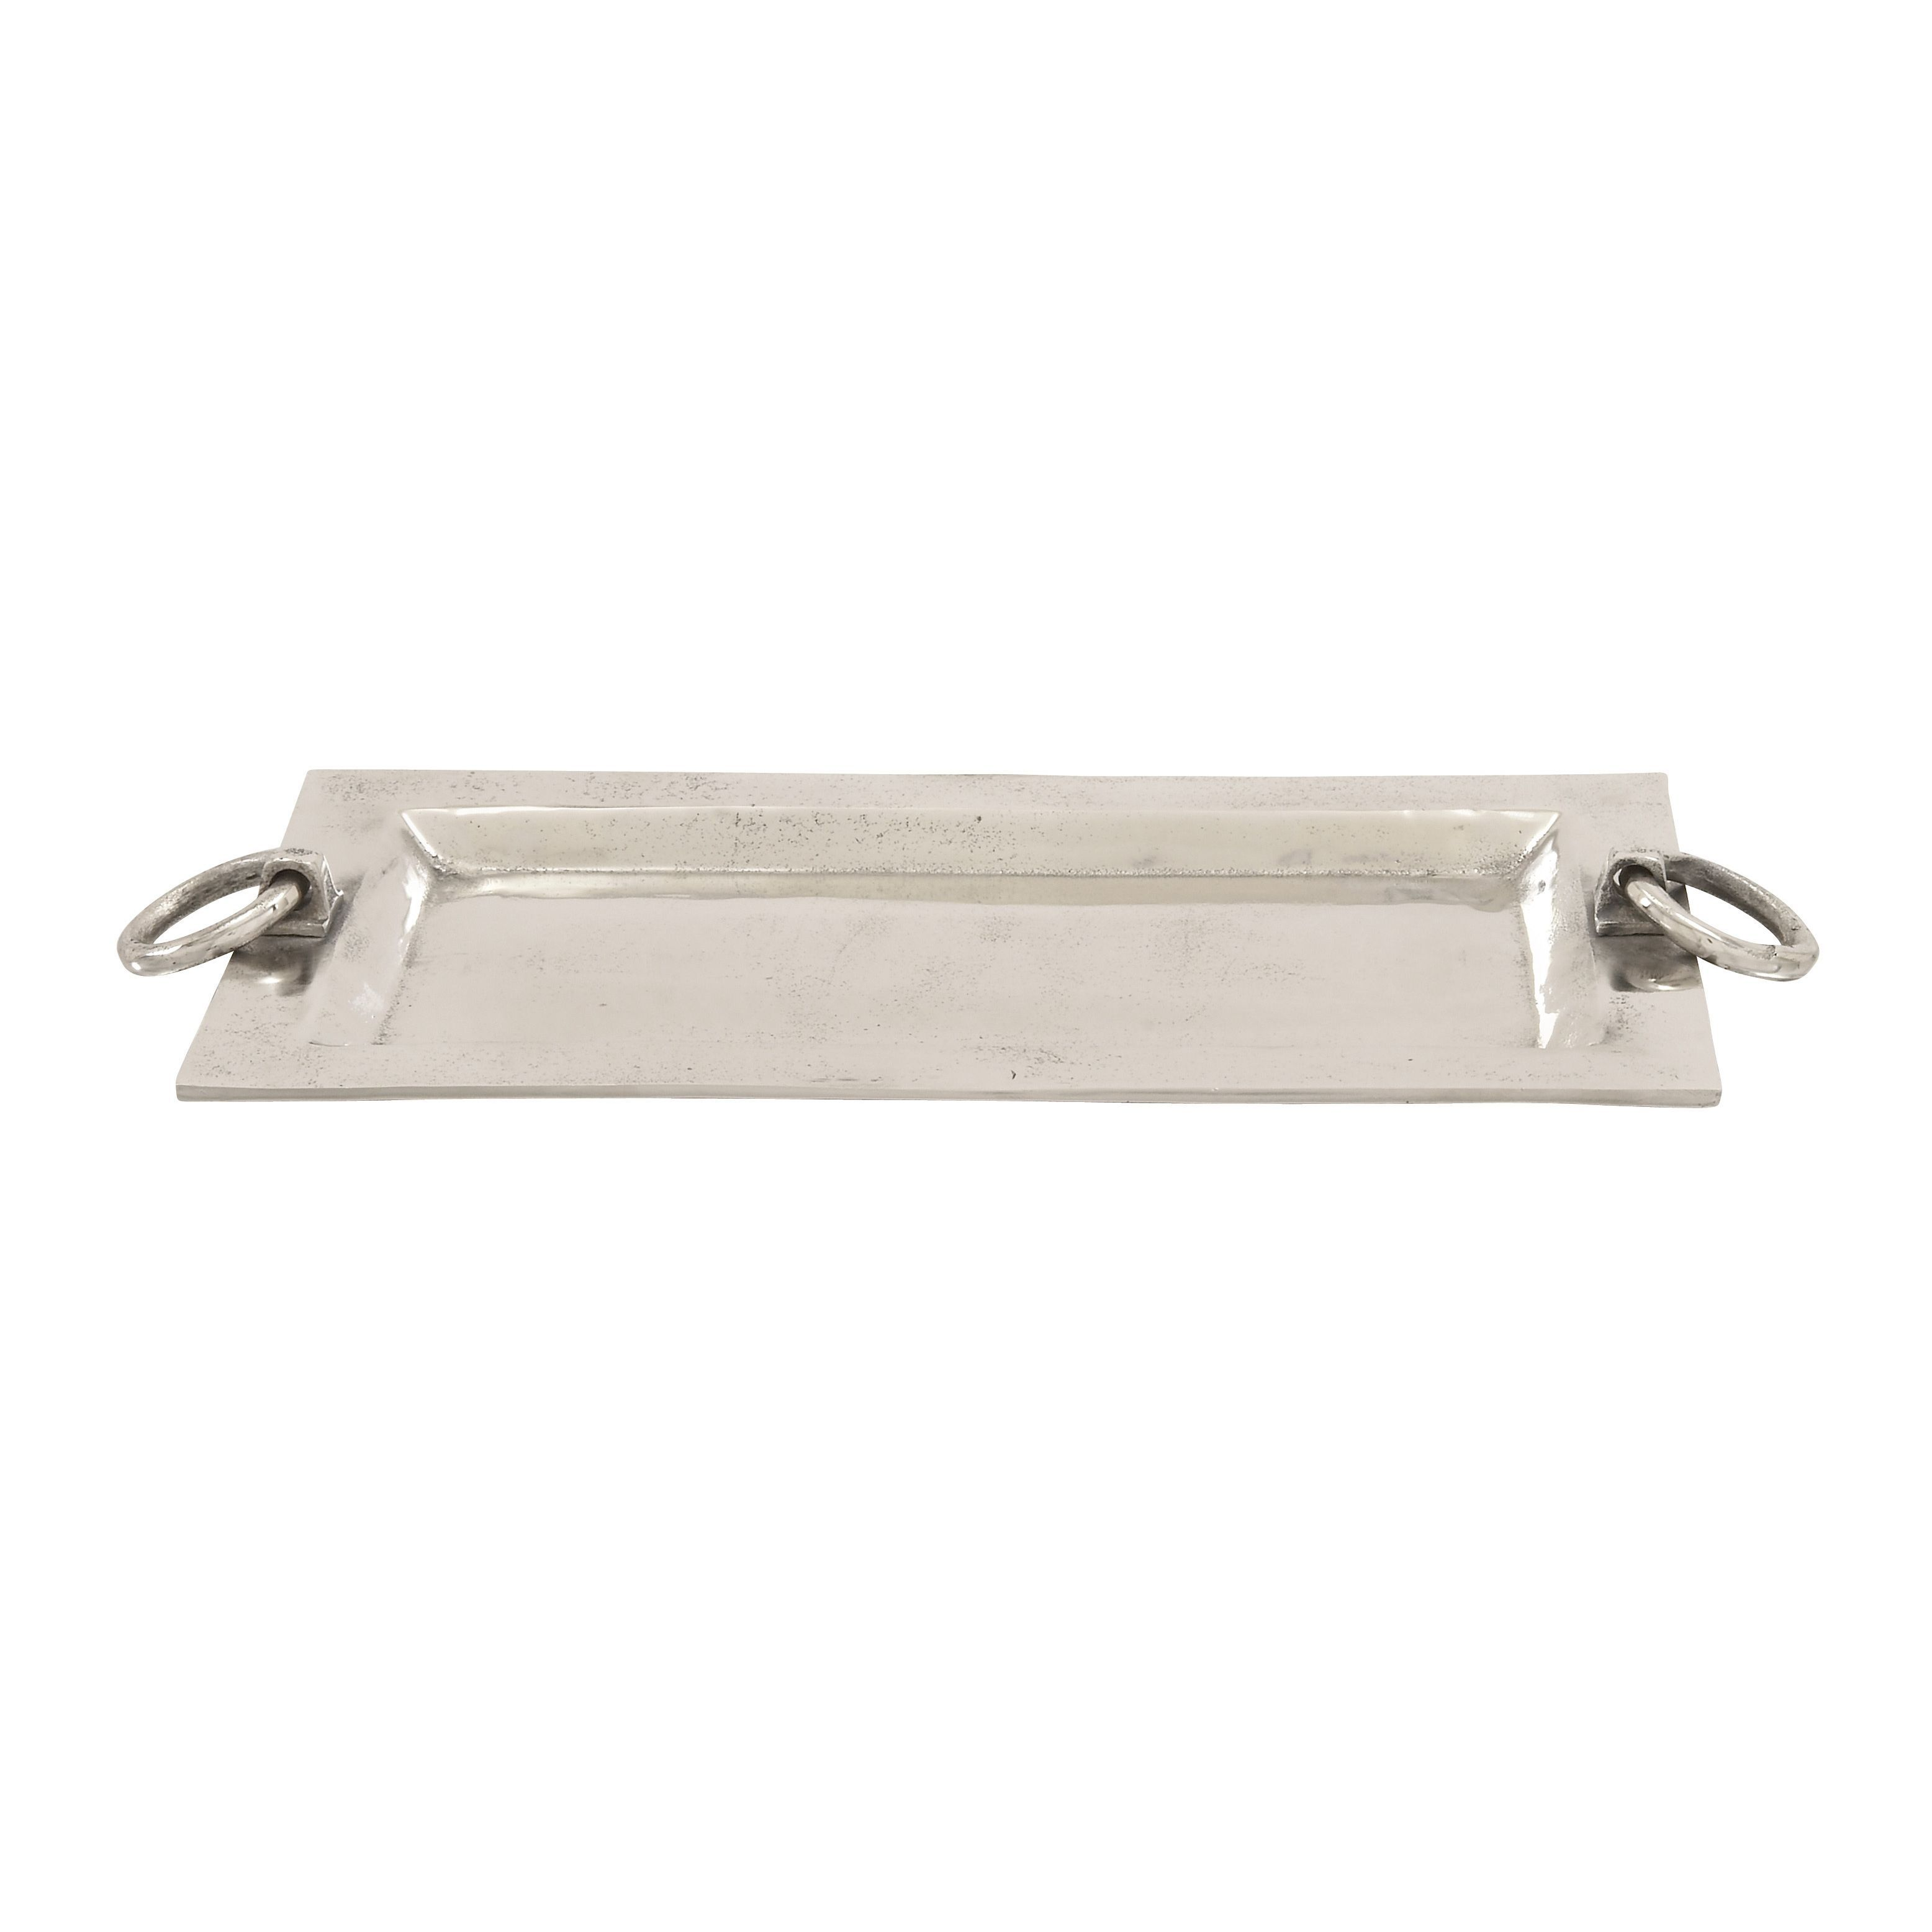 Benzara Aluminum Rectangle Tray 27-inch x 2-inch